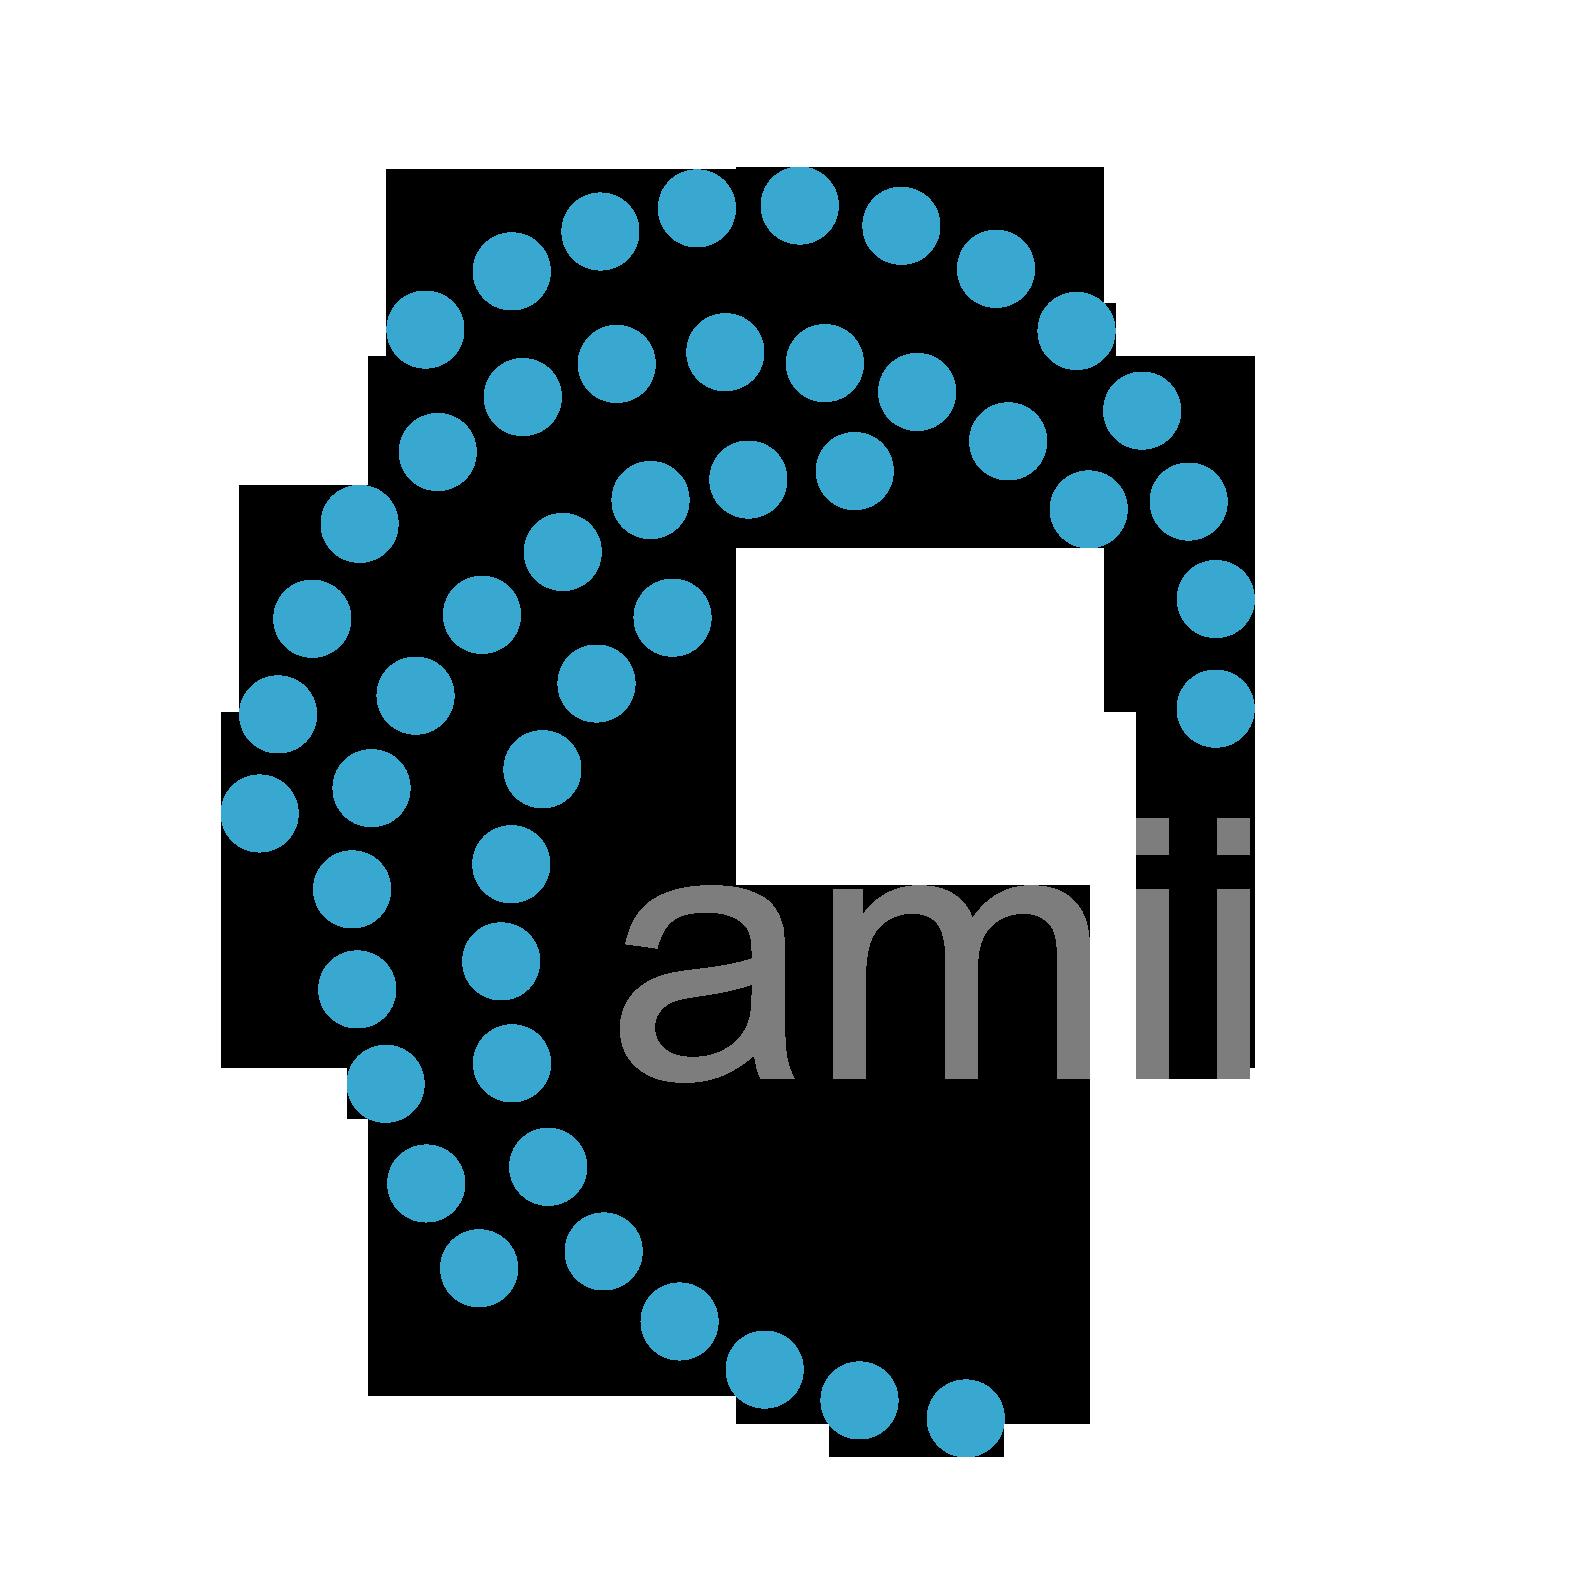 Logo amii